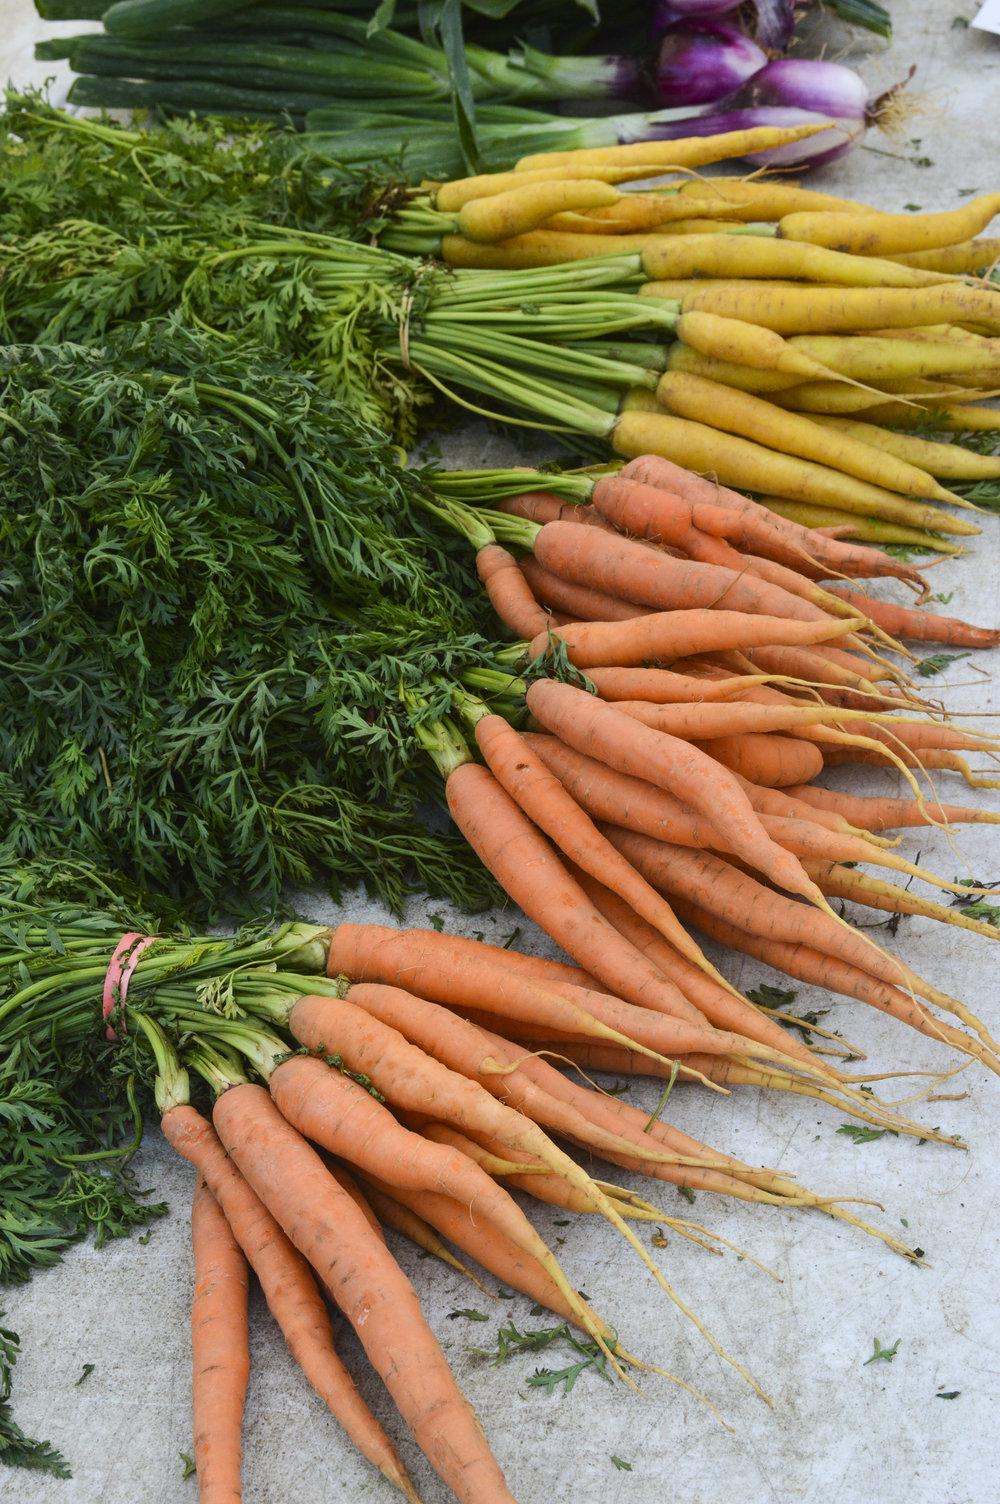 Carrots by Daniela Maria Castillo Frech